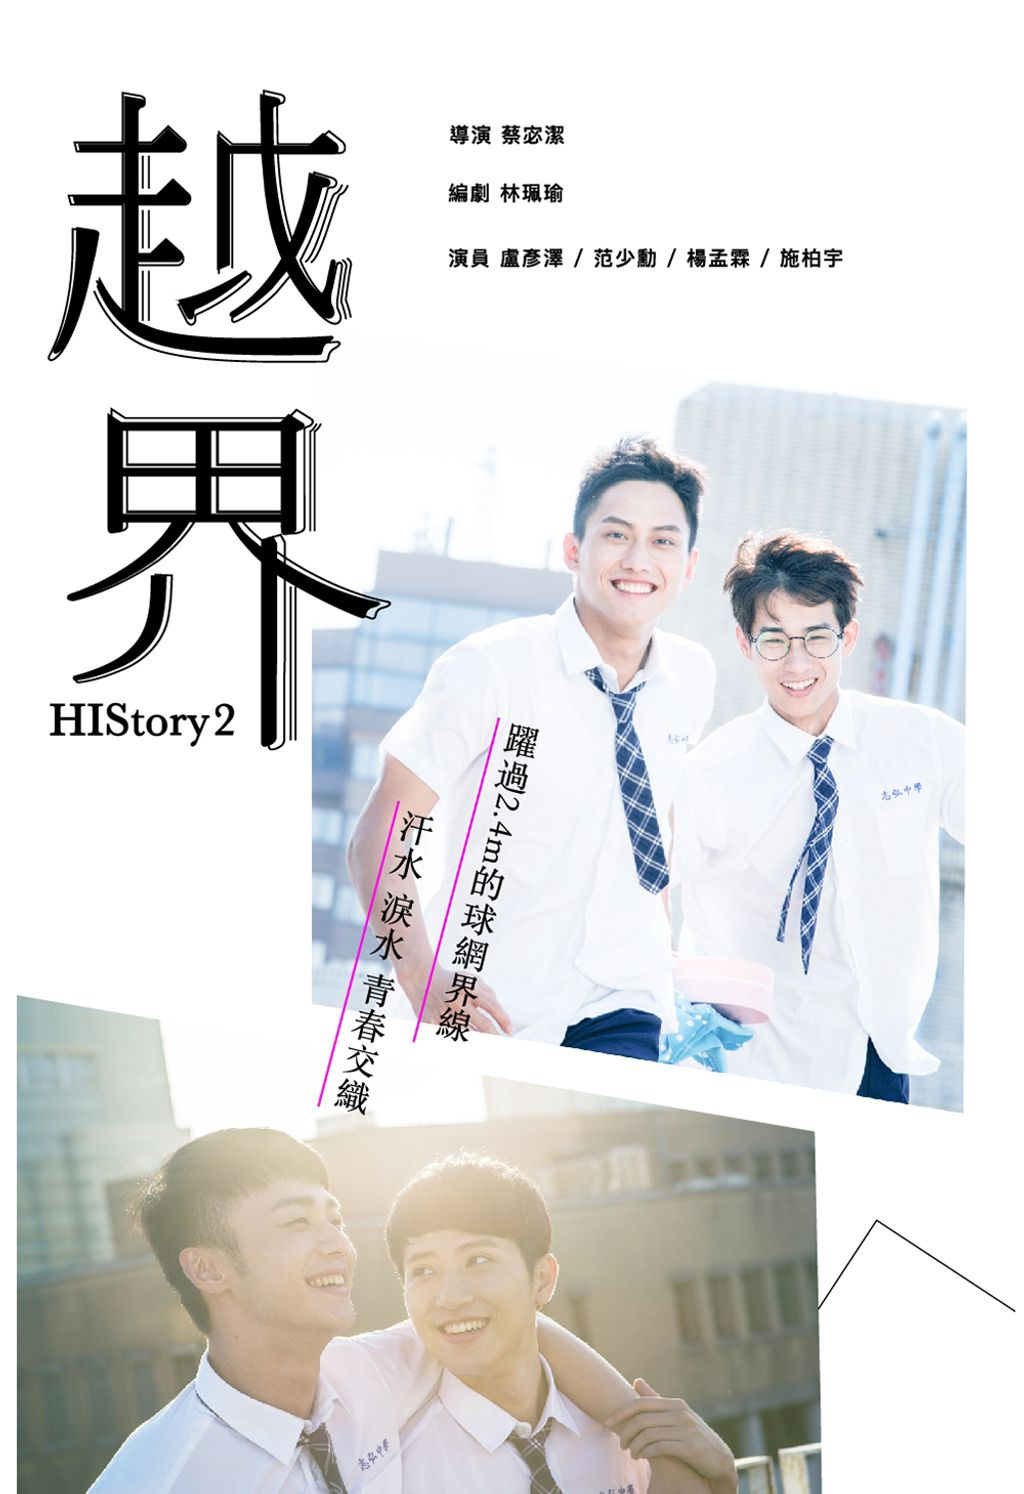 HIStory2-越界